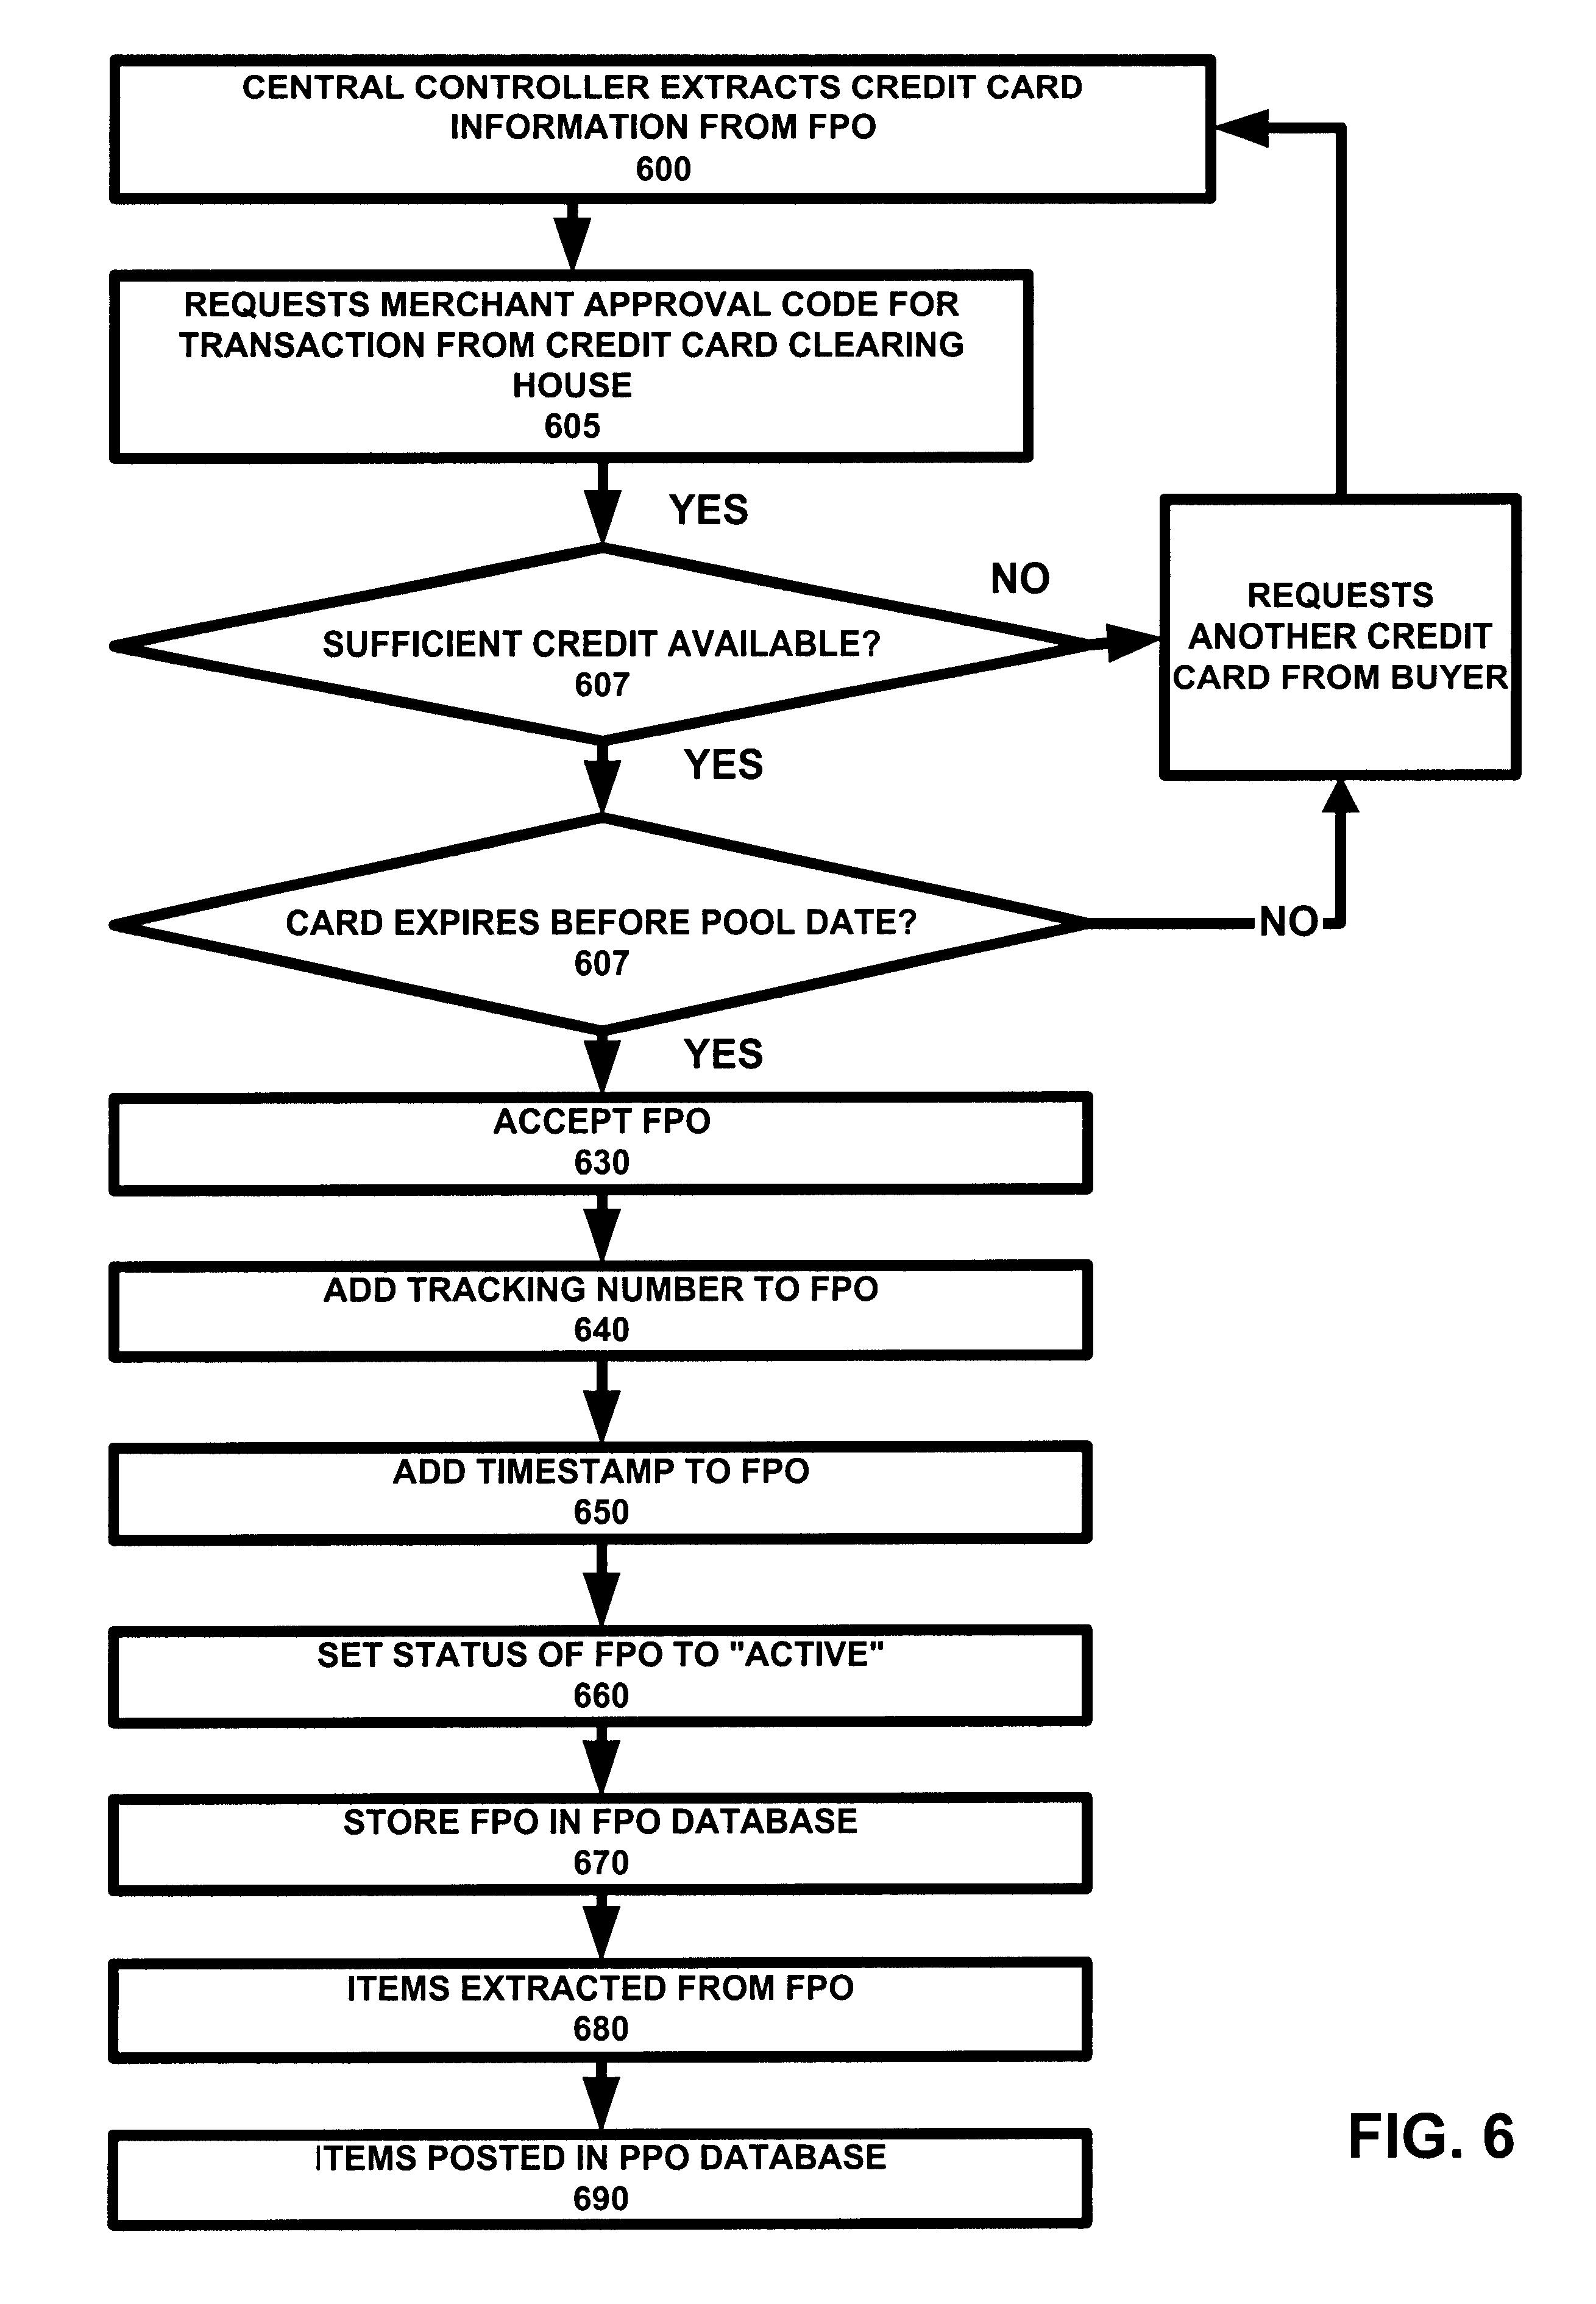 Patent US 6,260,024 B1